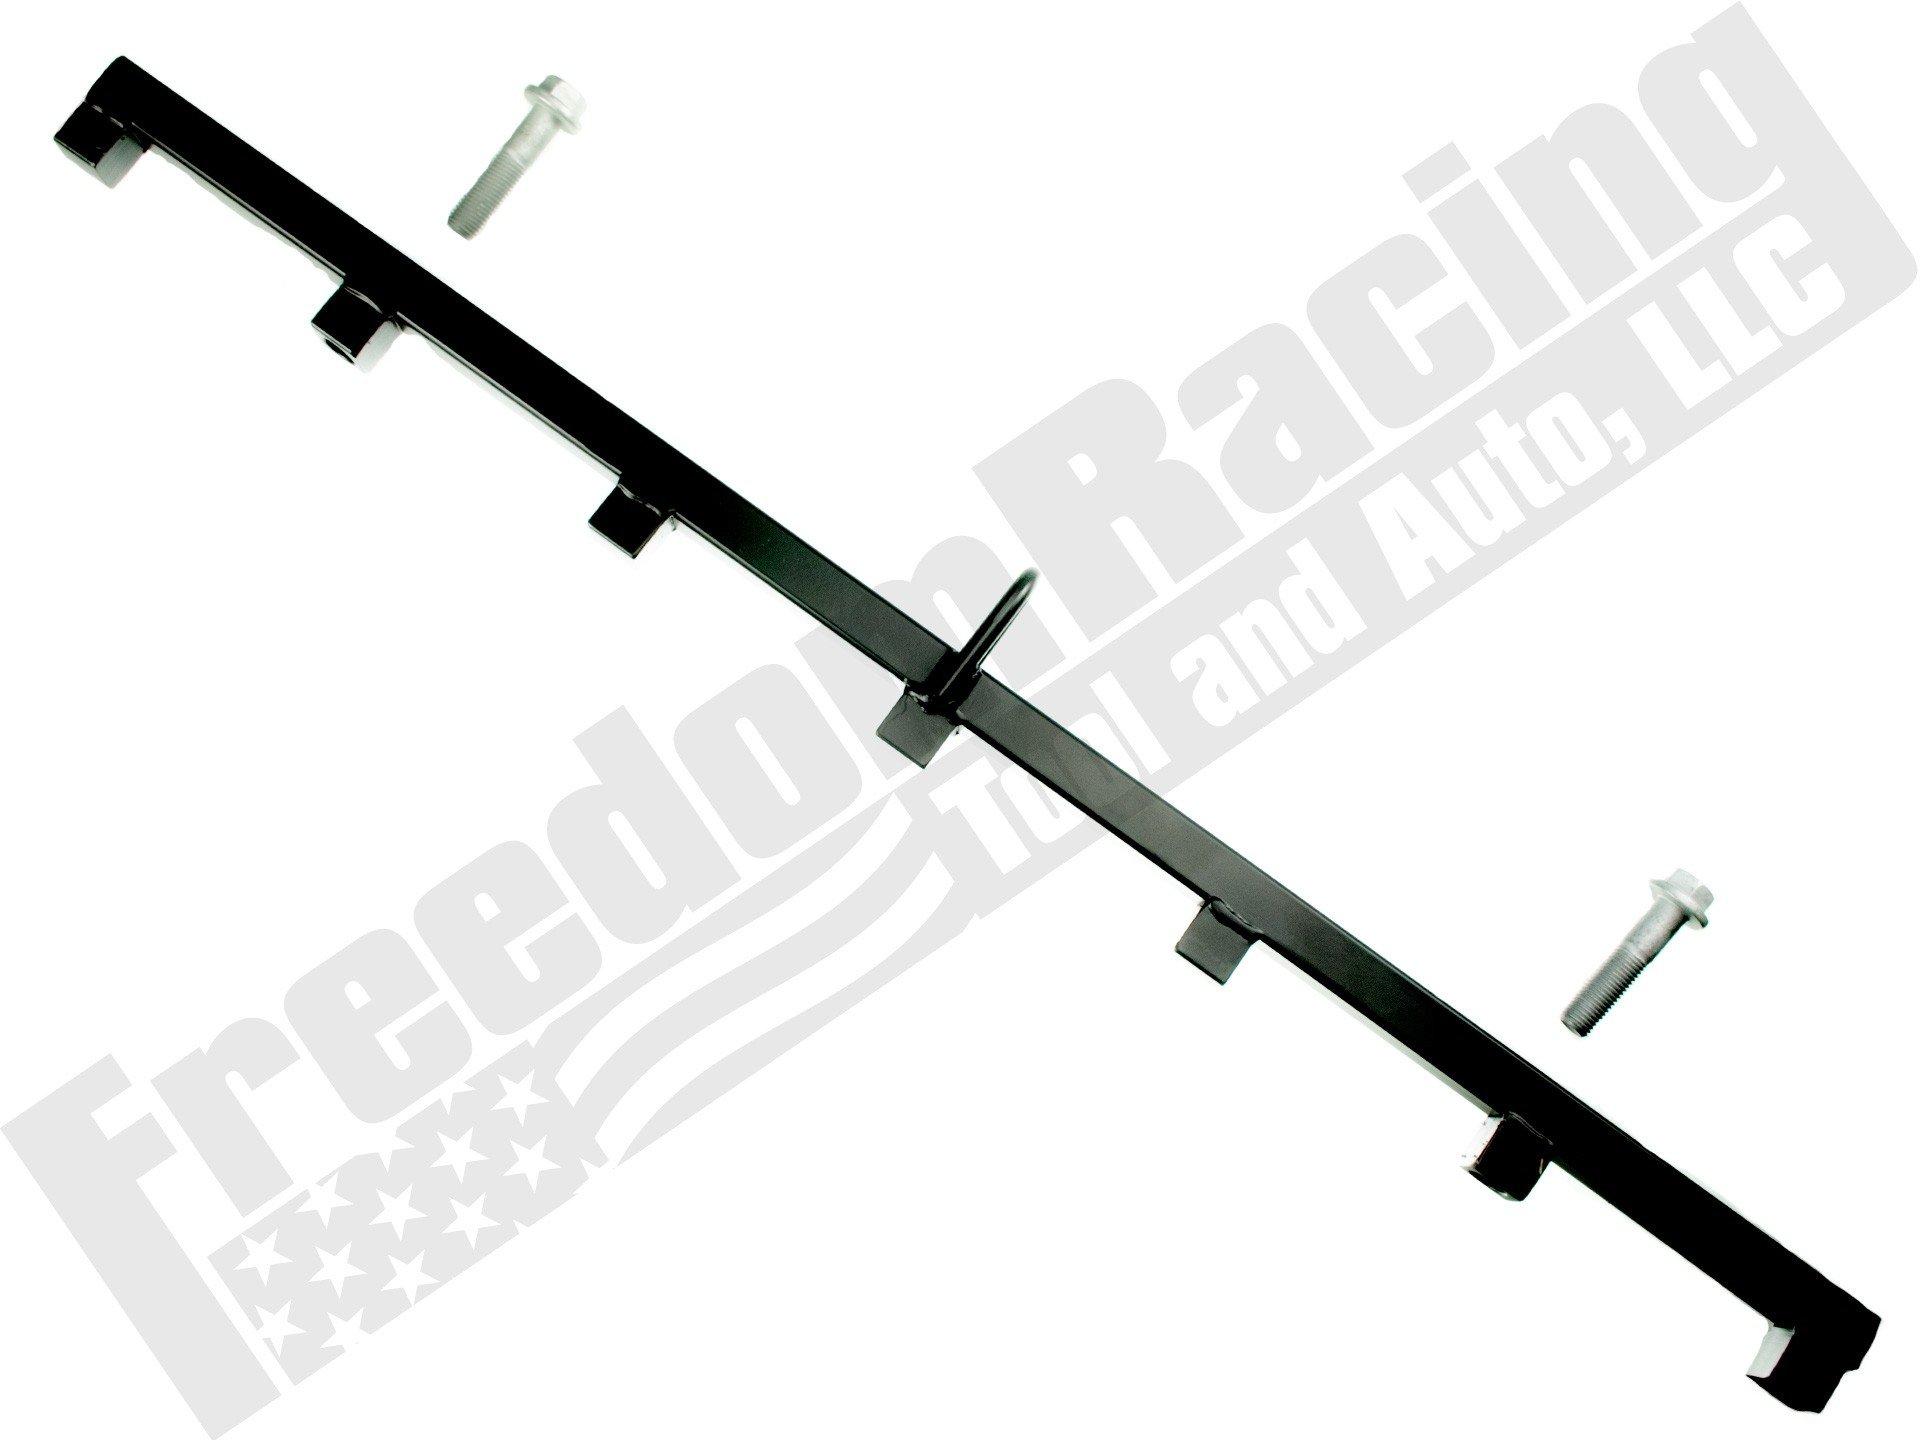 rocker shaft lifting tool